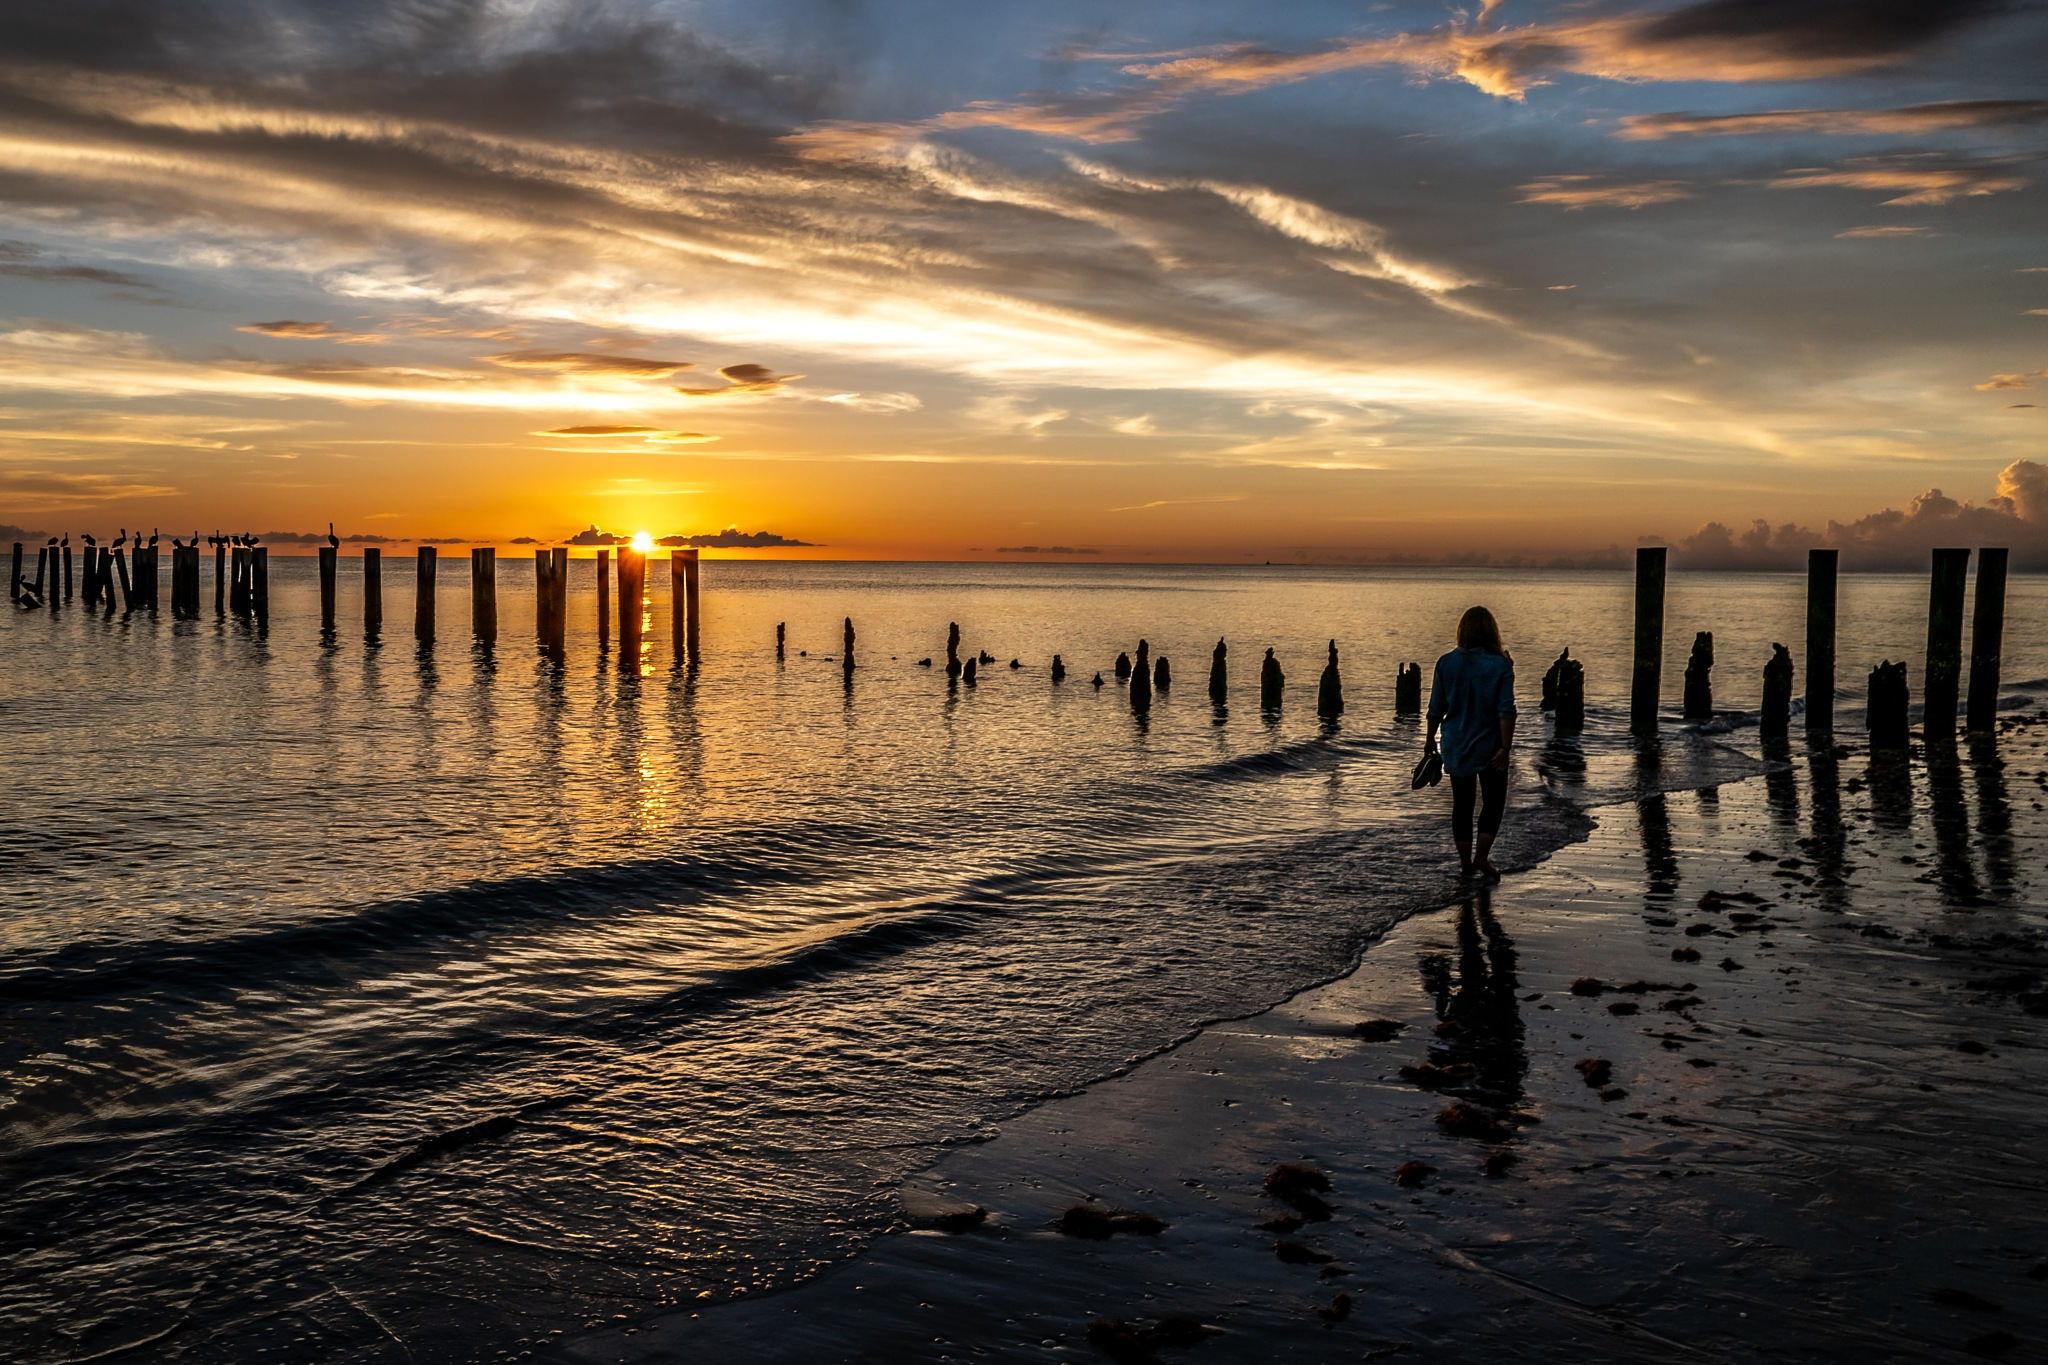 Walking on the beach by Omar Gomez